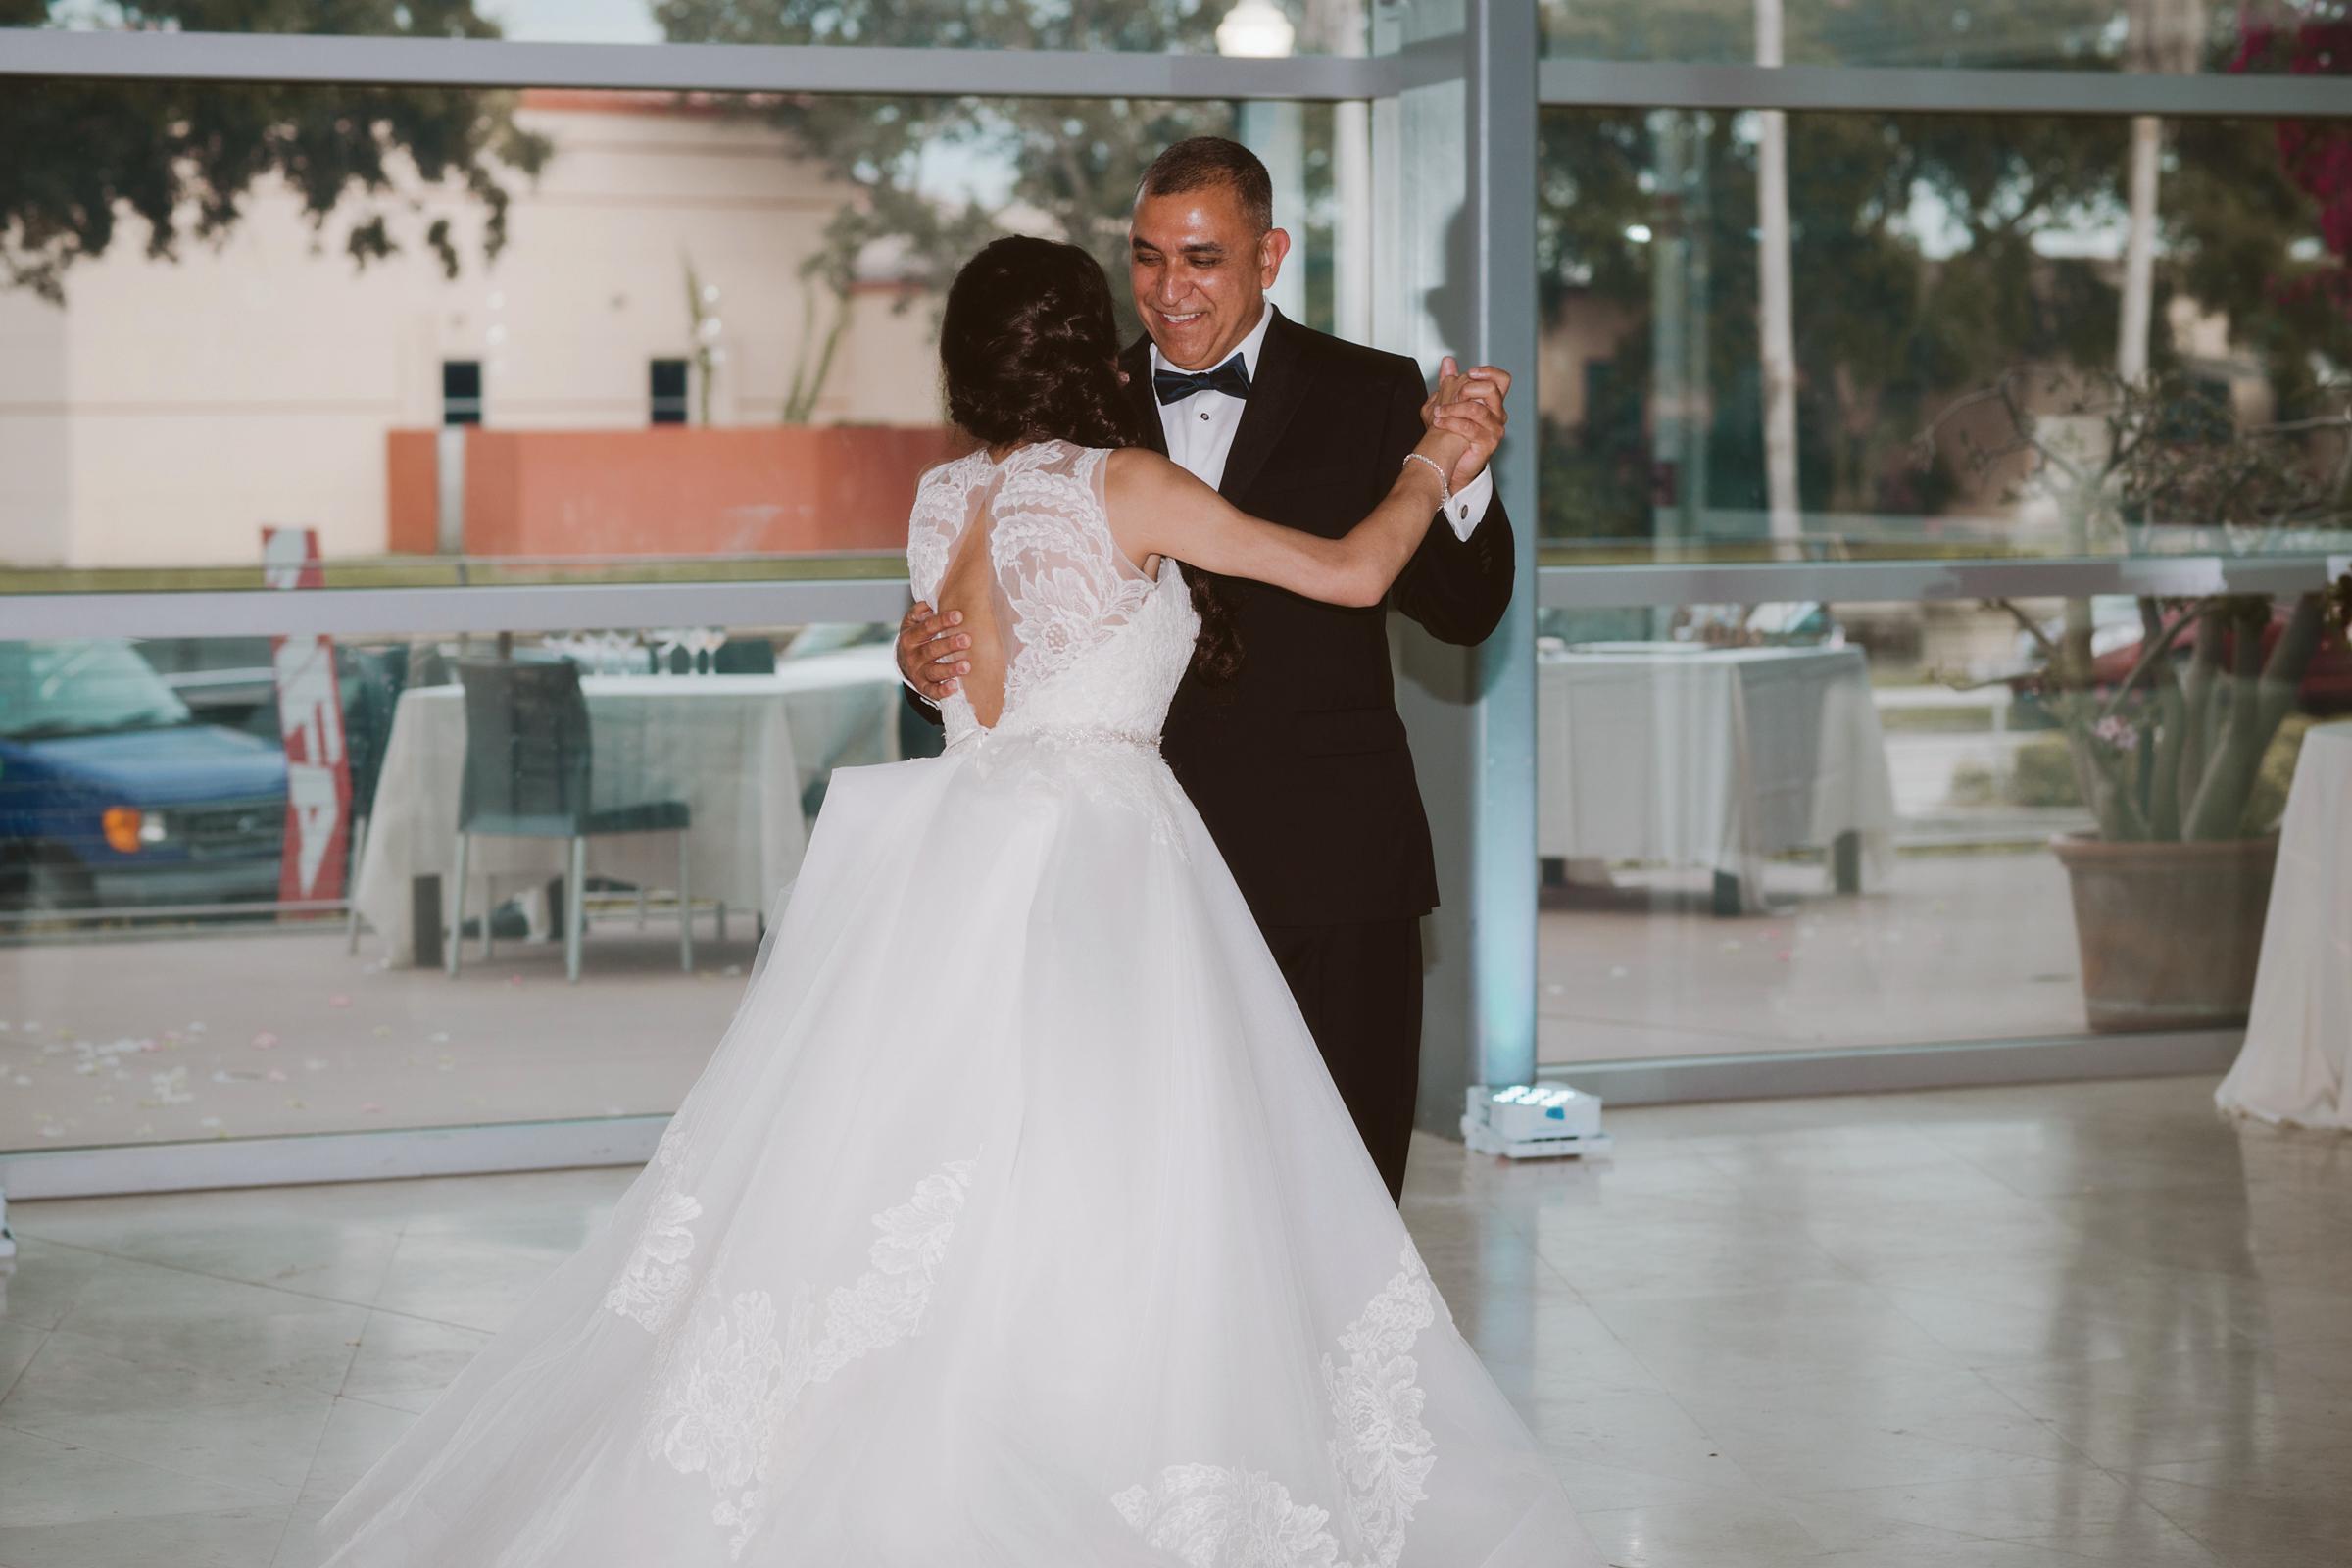 wedding day | MFA St Pete | Vanessa Boy Photography | vanessaboy.com-554.com |final.jpg